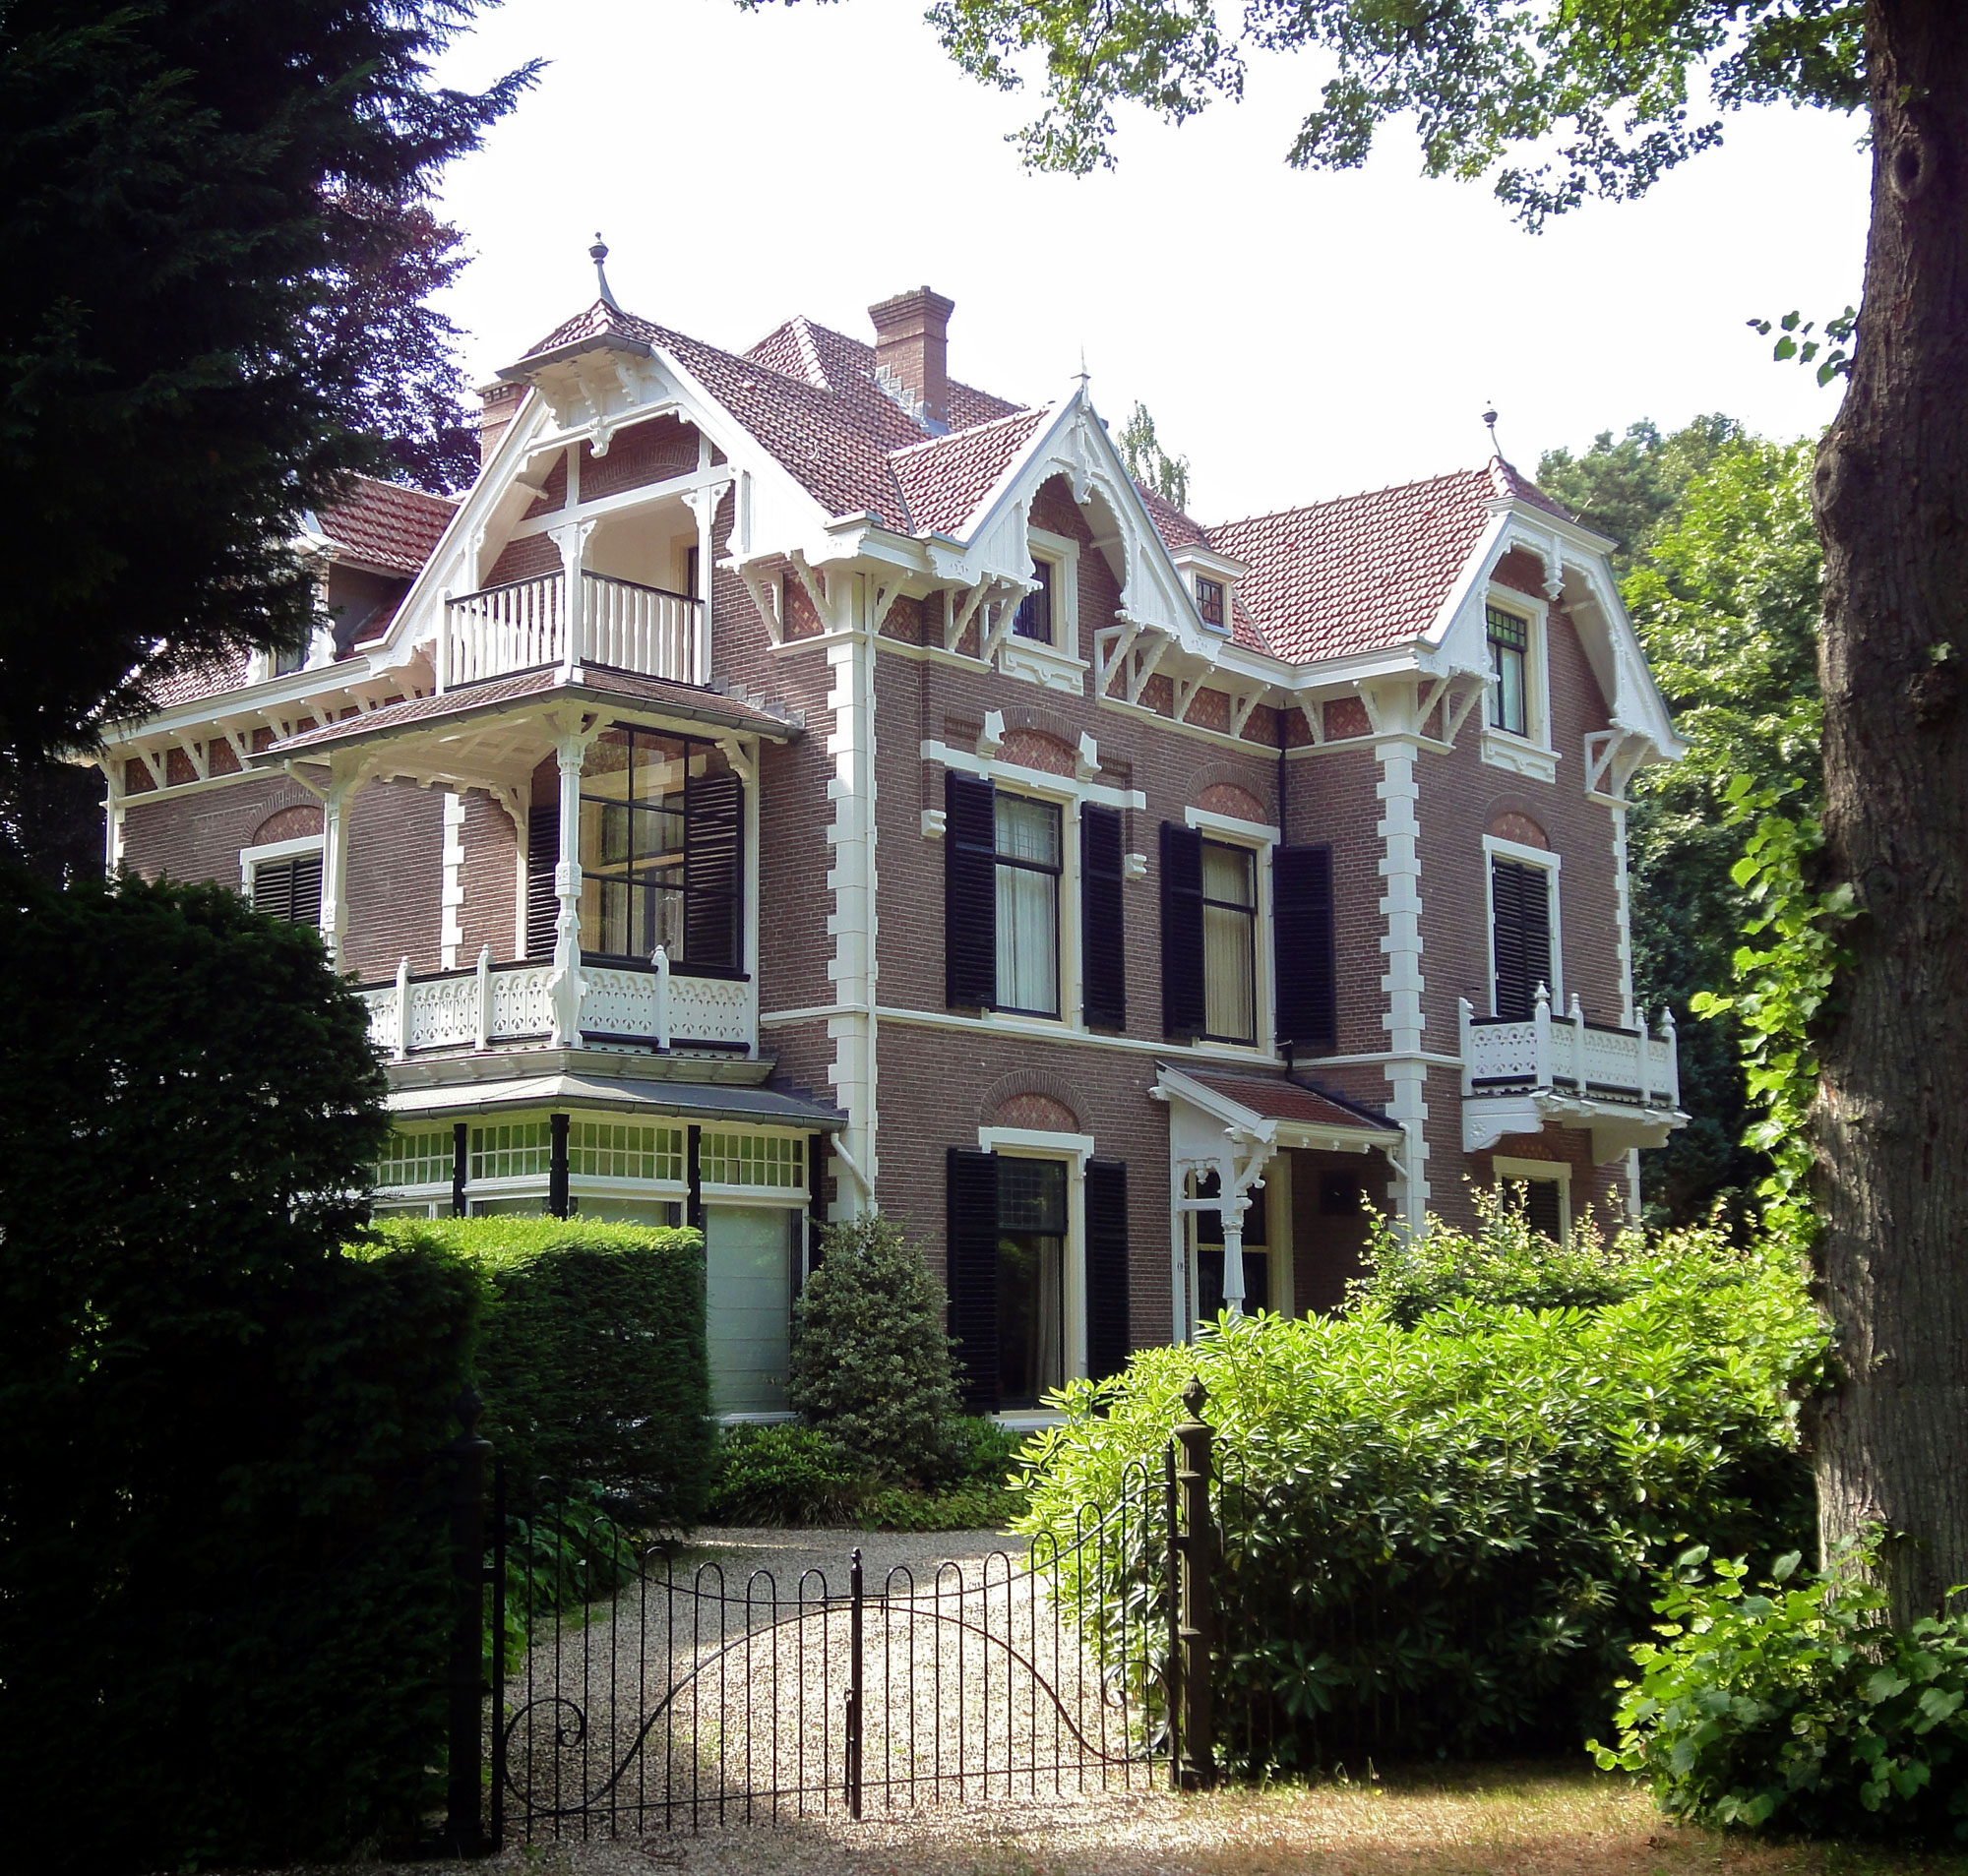 House in upper dacre st mca patrimoine - Location meublee non professionnelle fiscalite ...